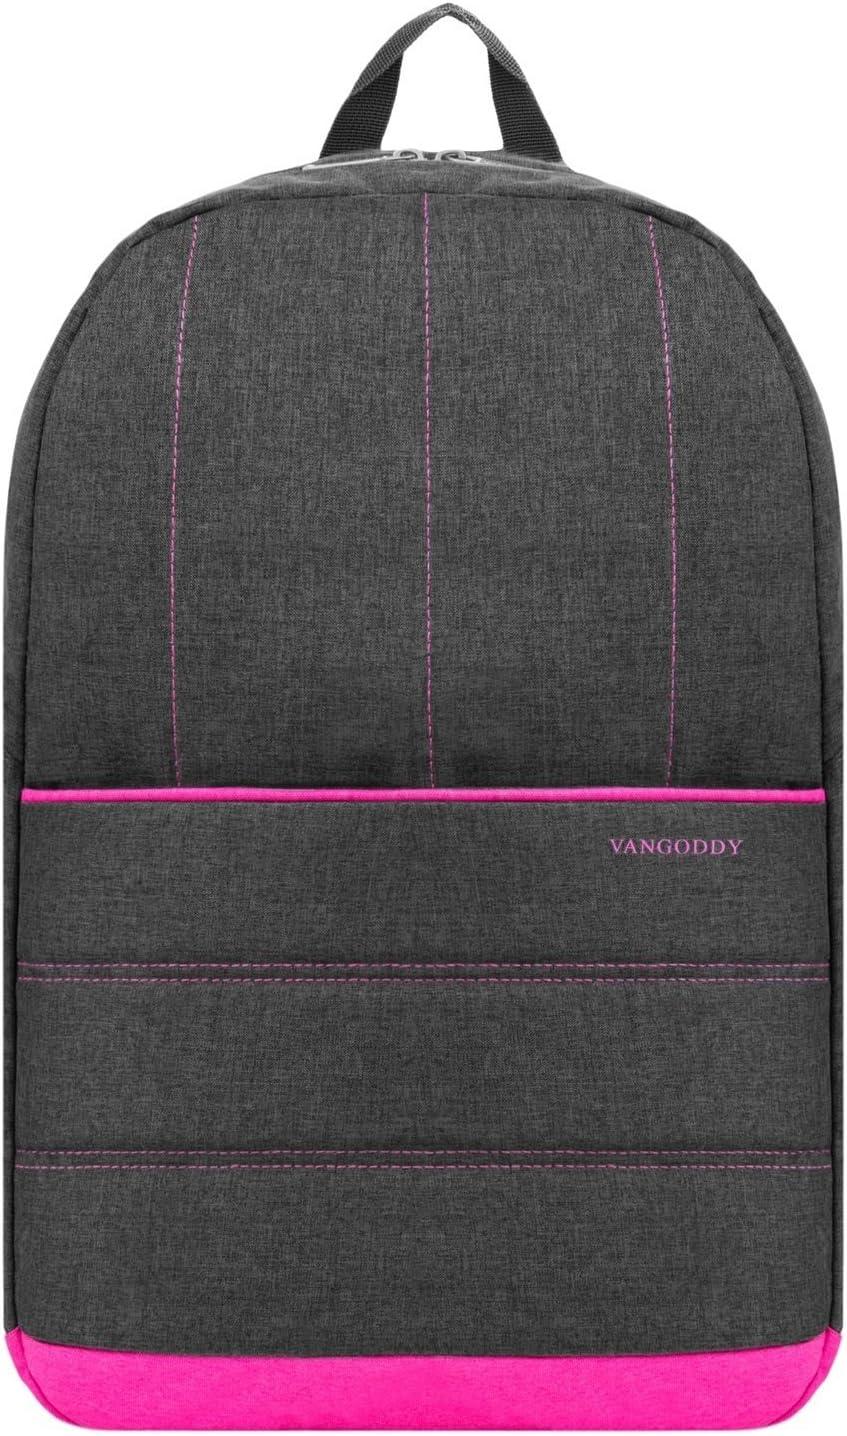 Travel Backpack Messenger Bag 15.6 Inch for Acer Aspire, Chromebook, One, XPS 12, Latitude 12 7000, Chromebook, Predator